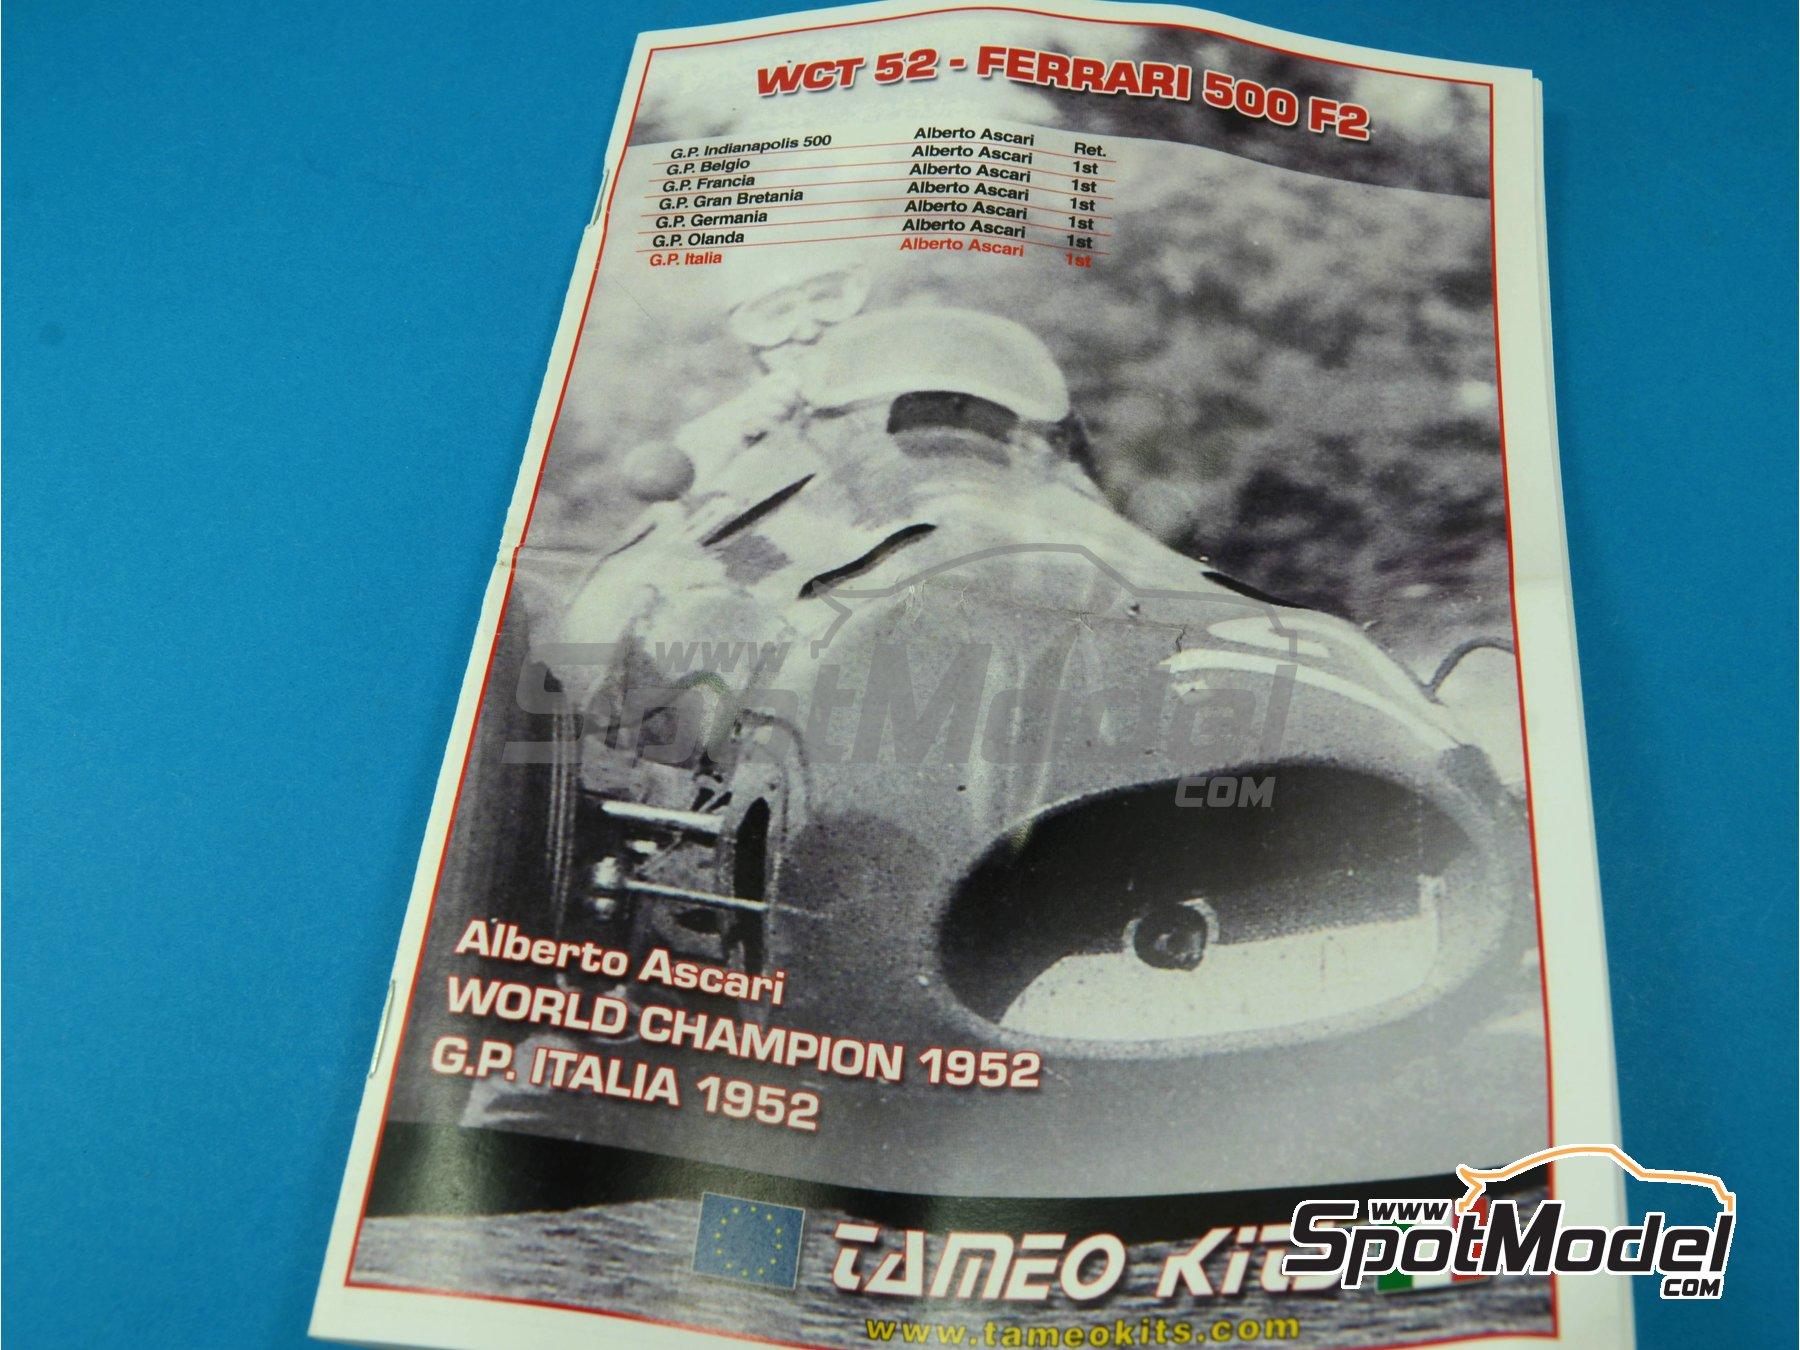 Image 2: Ferrari 500 F2 - Gran Premio de Fórmula 1 de Italia 1952 | Maqueta de coche en escala1/43 fabricado por Tameo Kits (ref.WCT052)